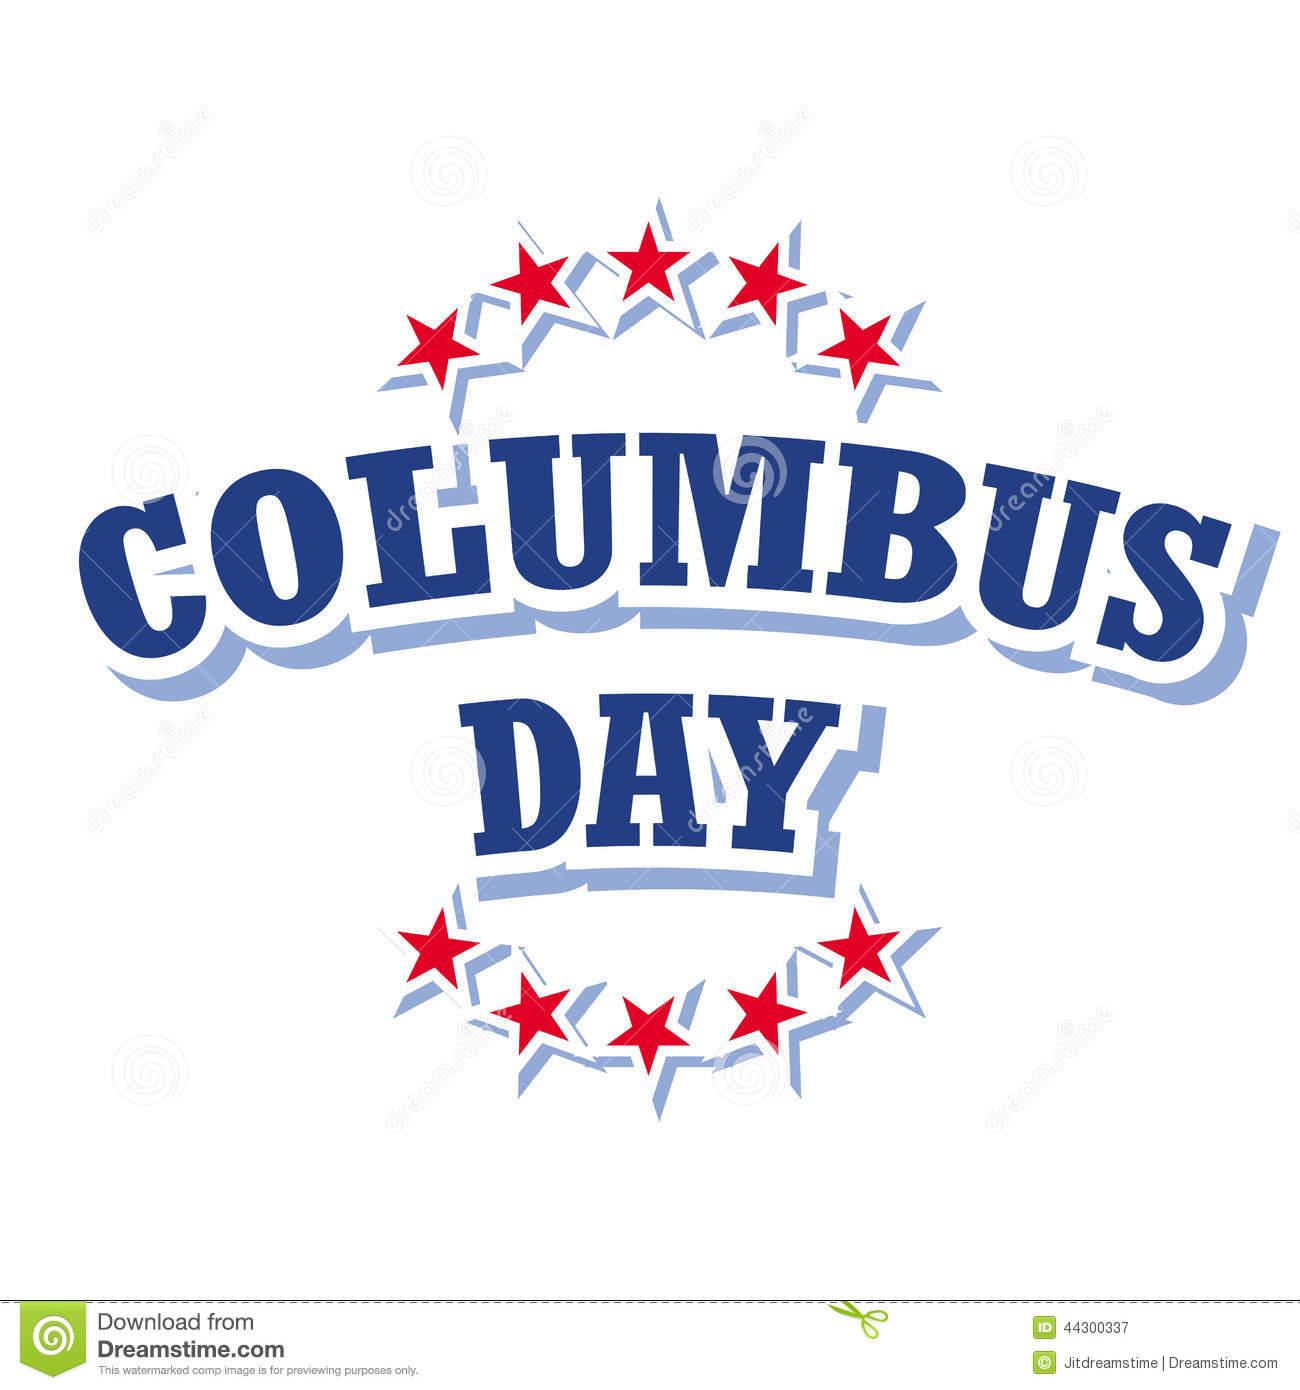 Columbus day clipart - .-Columbus day clipart - .-8